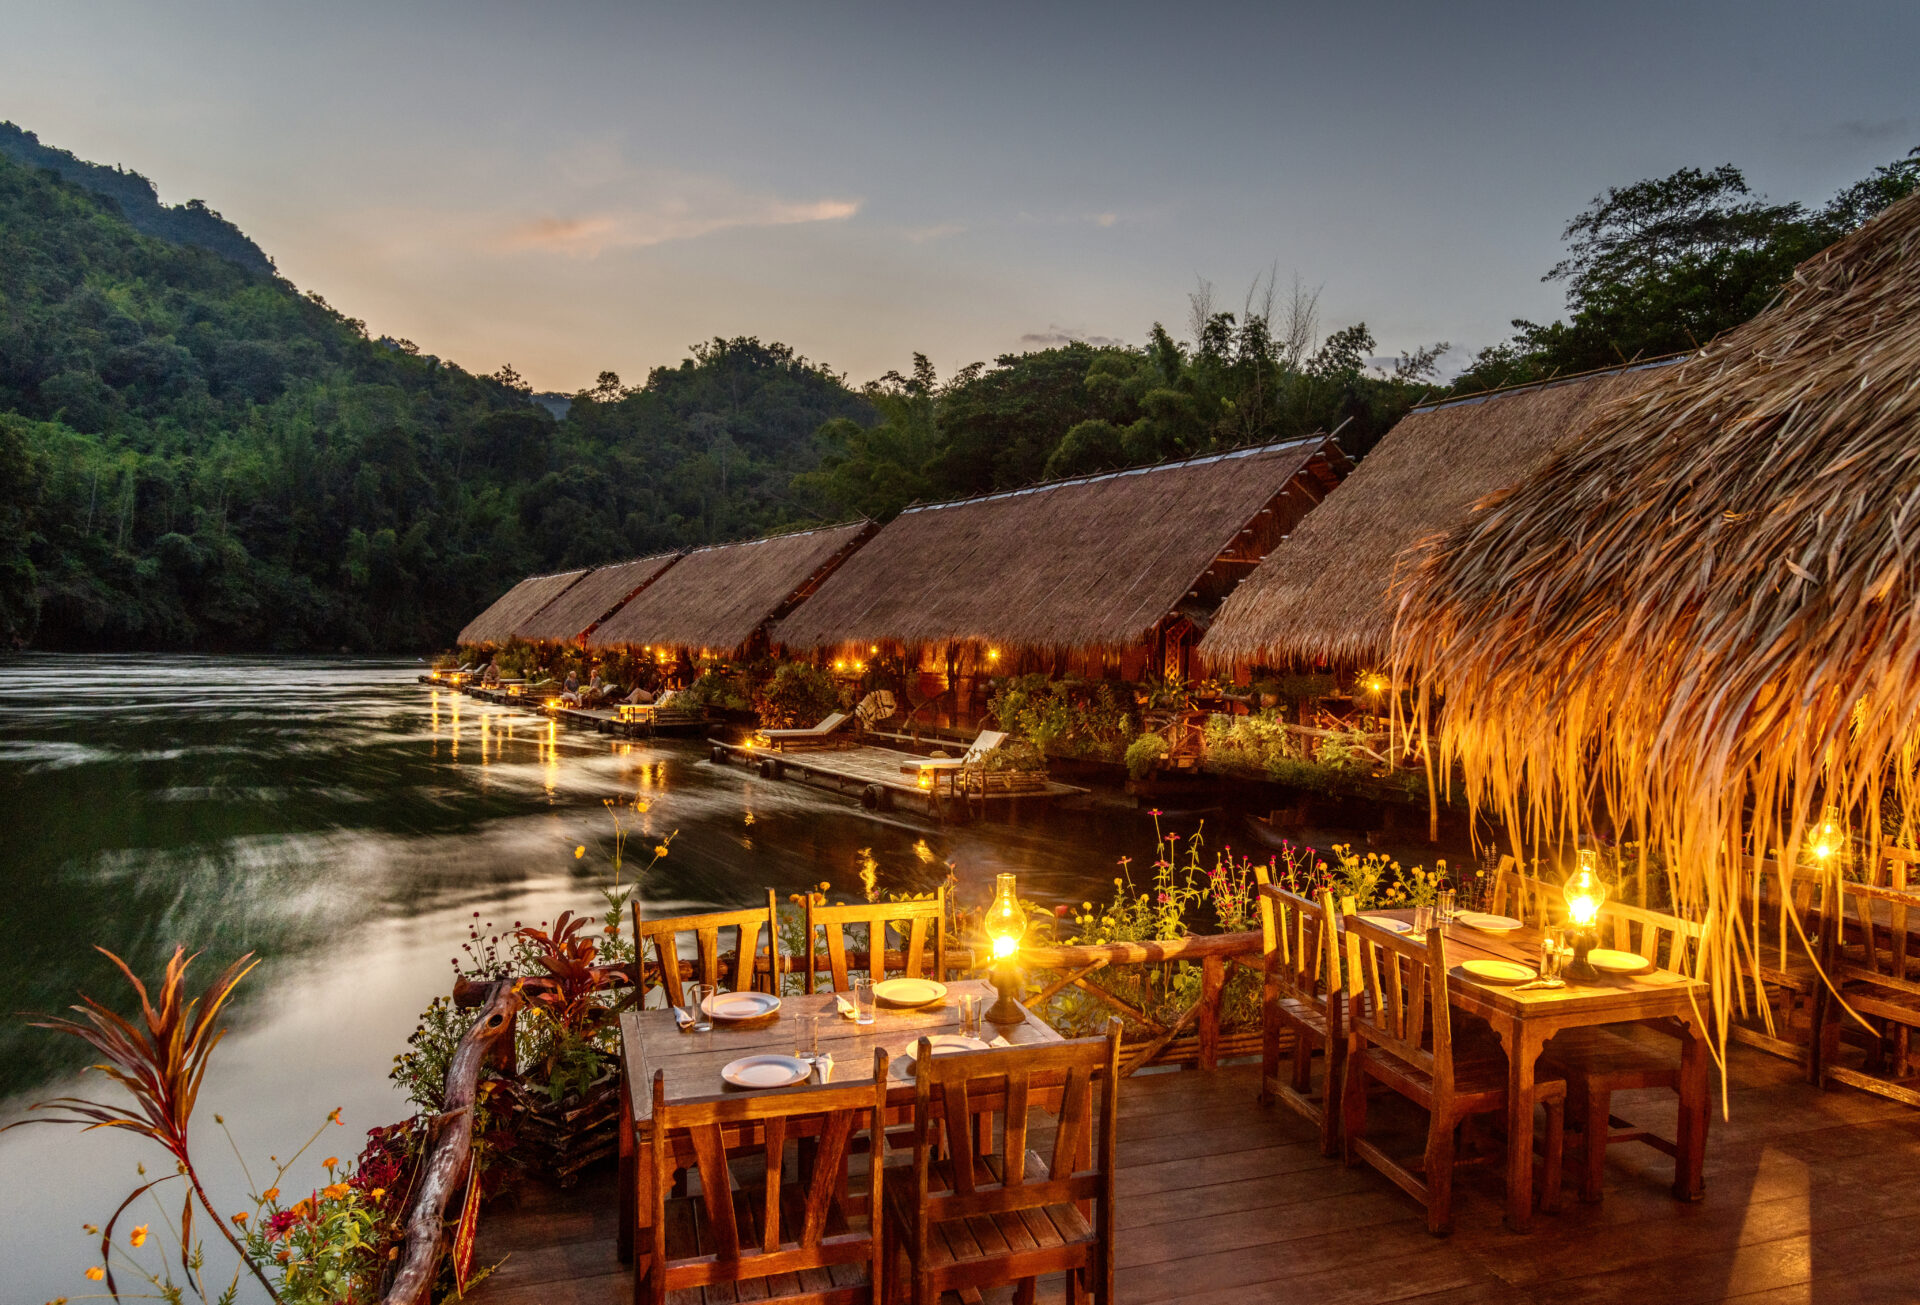 Floating Hotel in Kanchanaburi River Kwai Jungle Rafts Resort Saiyok